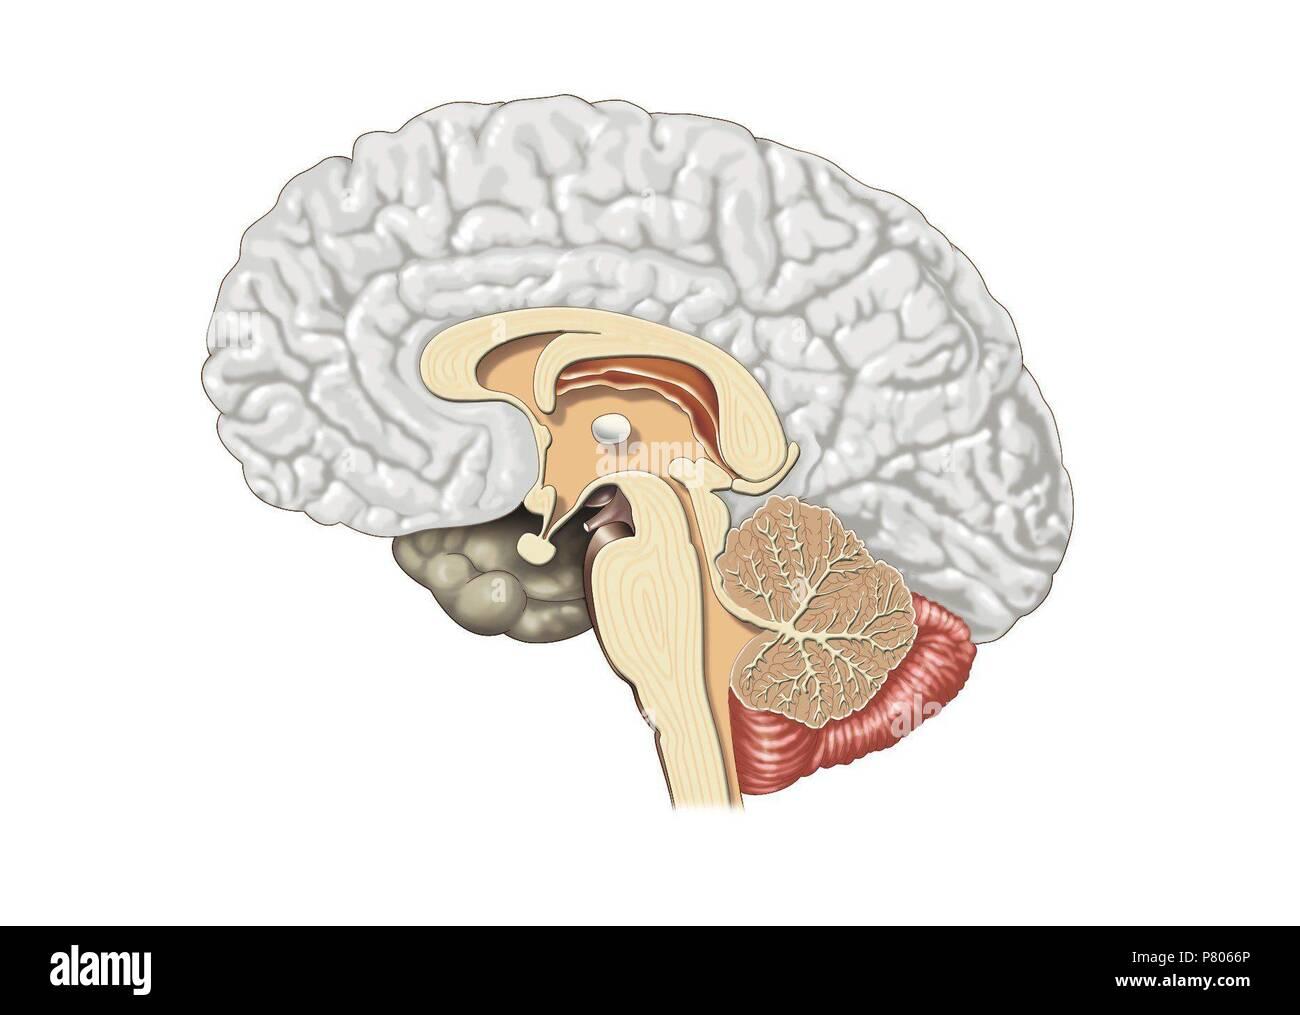 La Estructura Interna Del Cerebro Foto Imagen De Stock